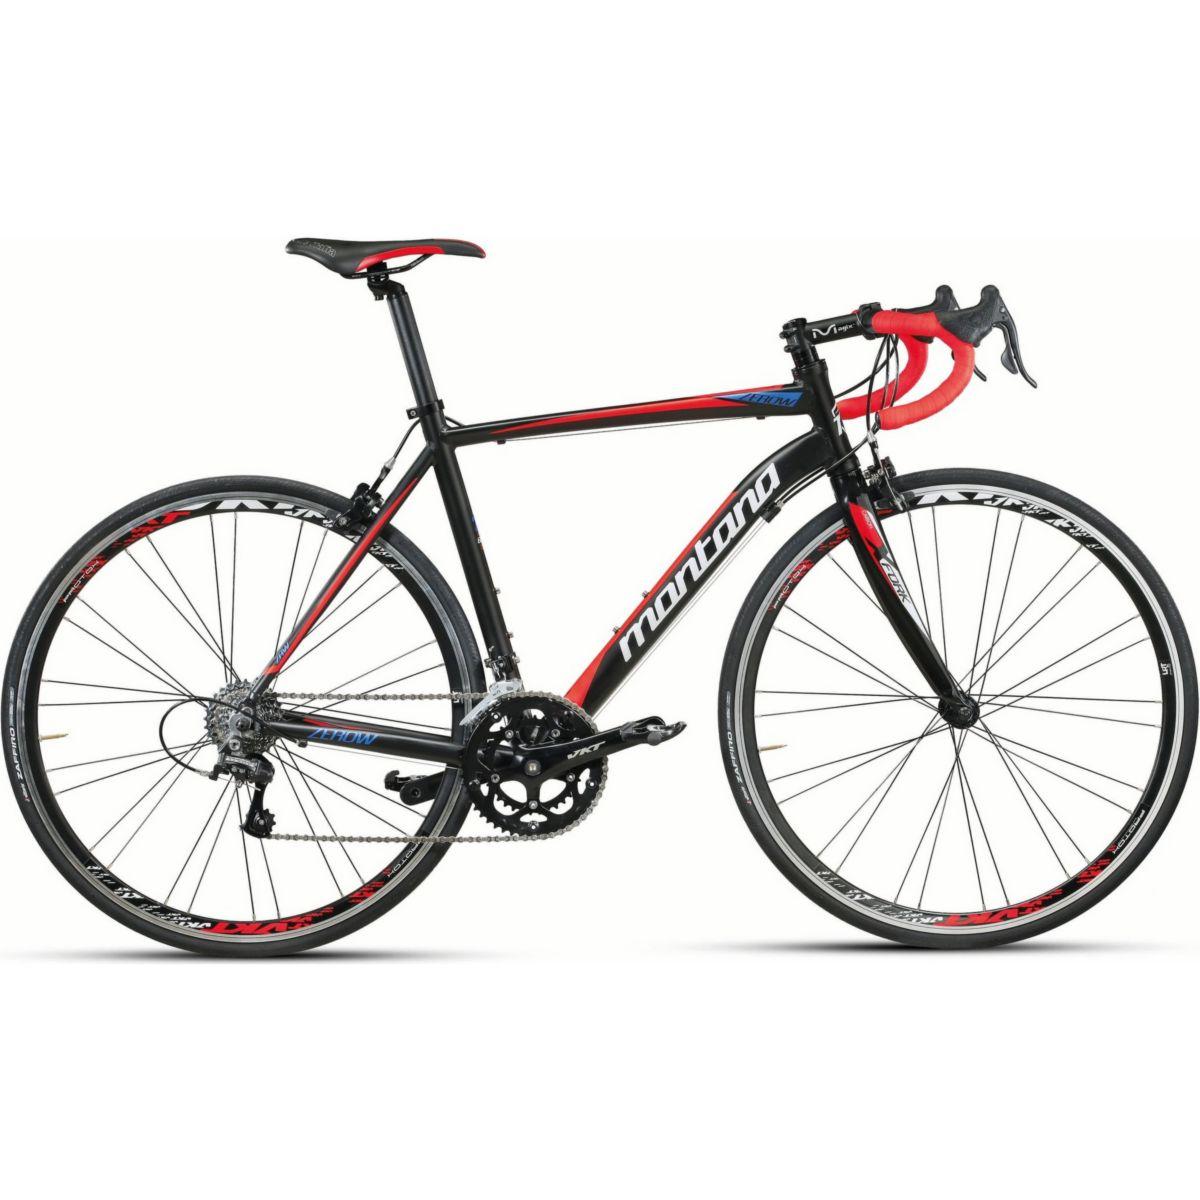 28 Zoll Rennrad Campagnolo 20 Gang Montana Zerow schwarz-rot, 52cm jetztbilligerkaufen